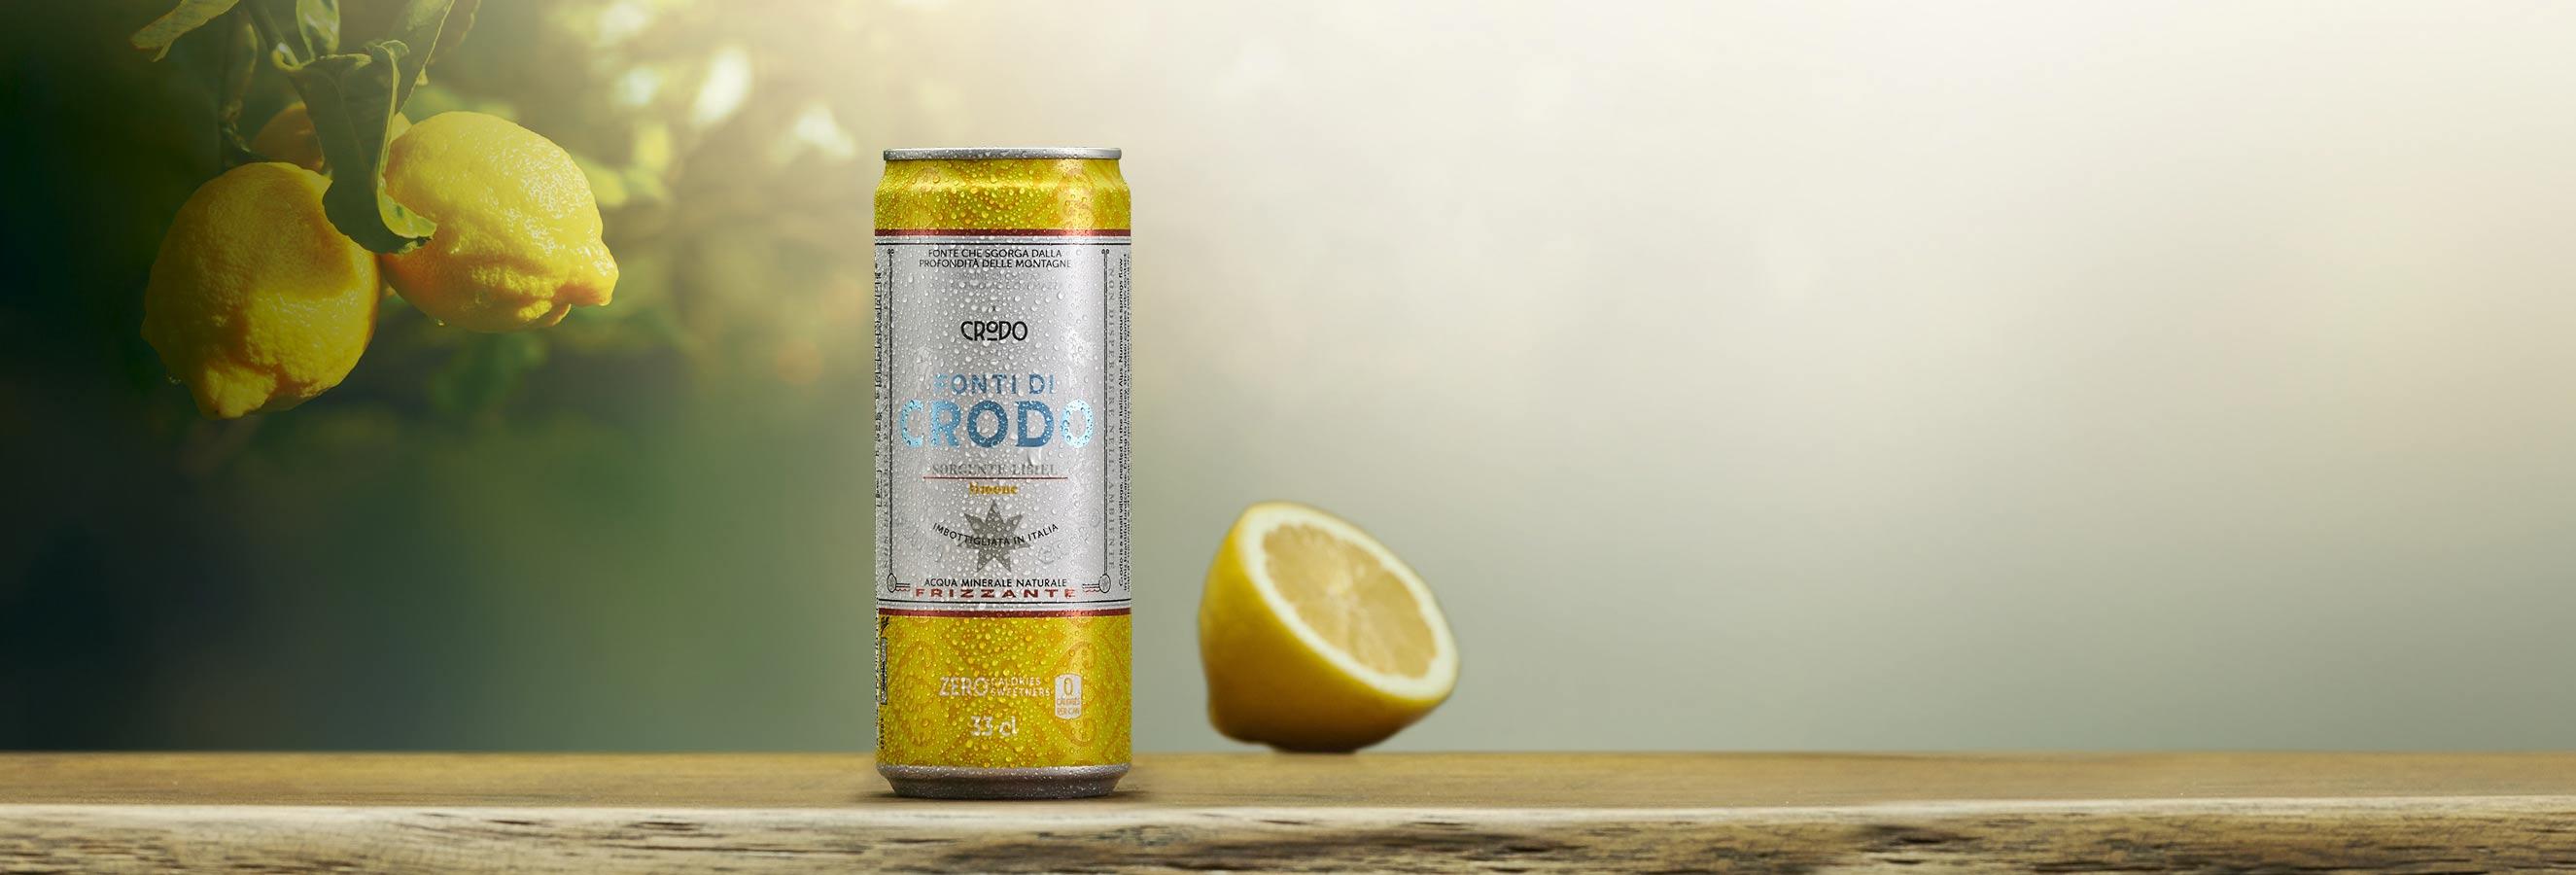 FONTIDICRODO-Web-Image-2650x900-Lemon